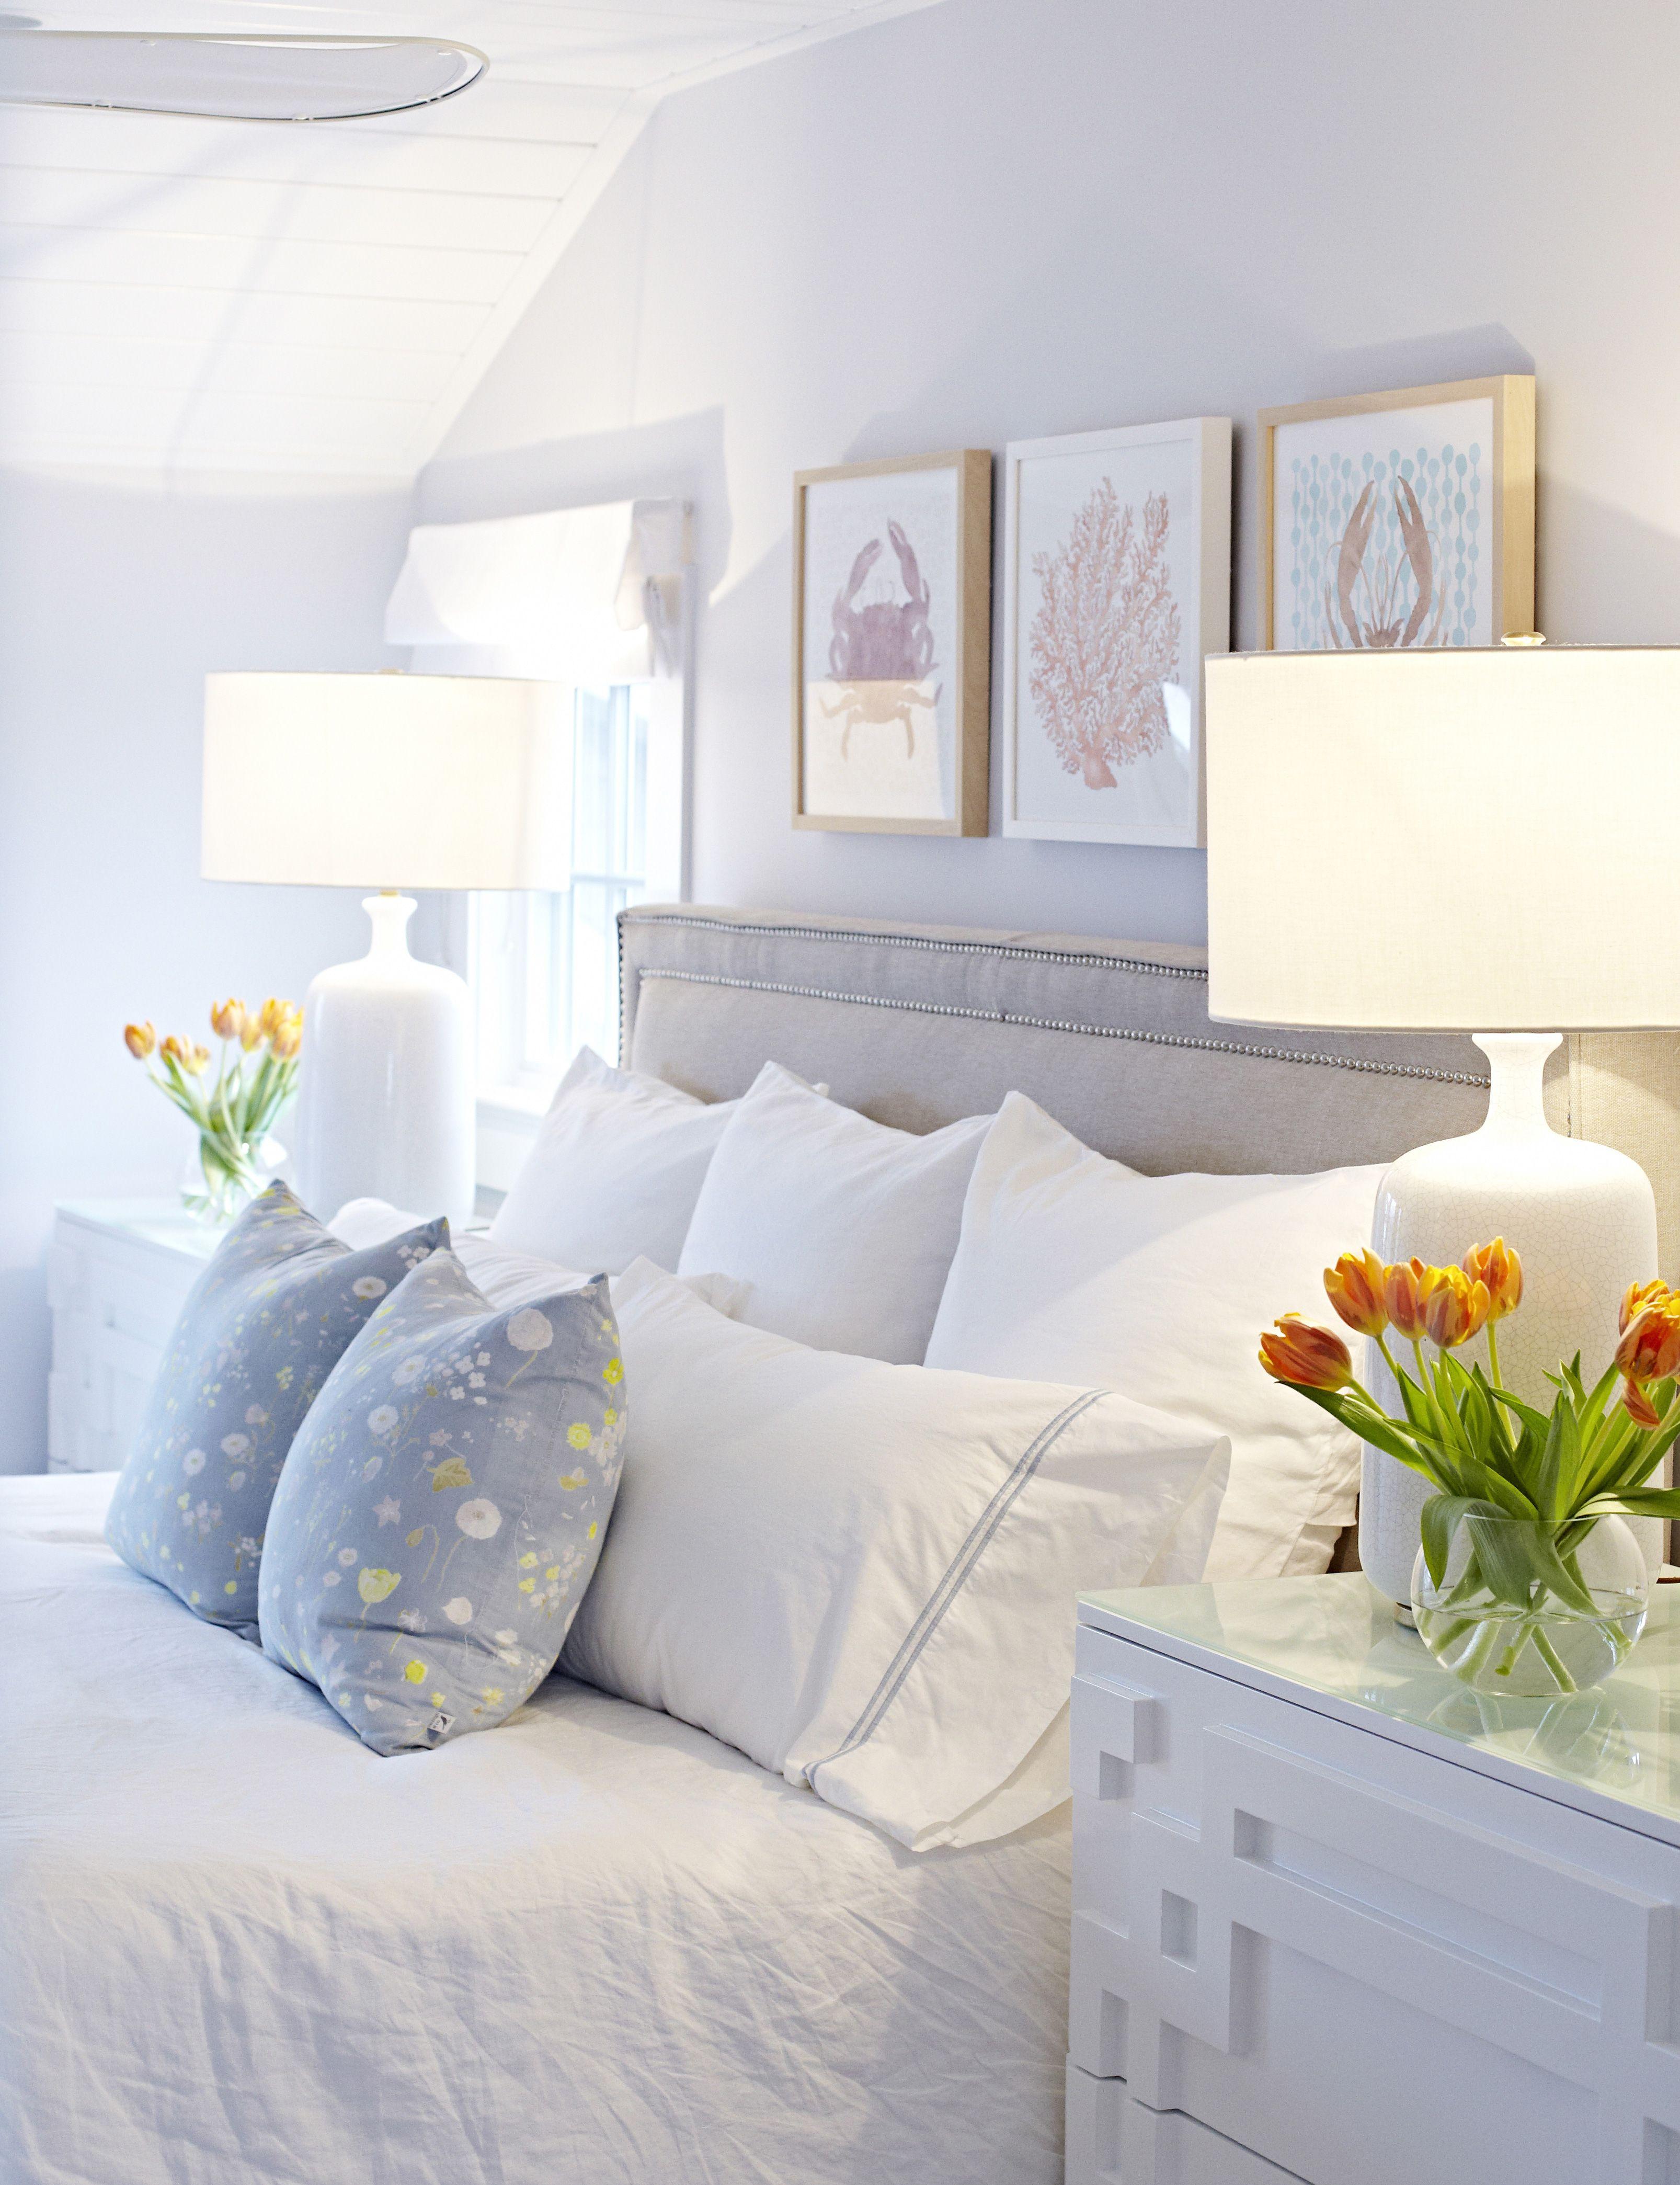 Strange Beach House Bedroom Home Decor Coastal Farmhouse Bunga Interior Design Ideas Philsoteloinfo